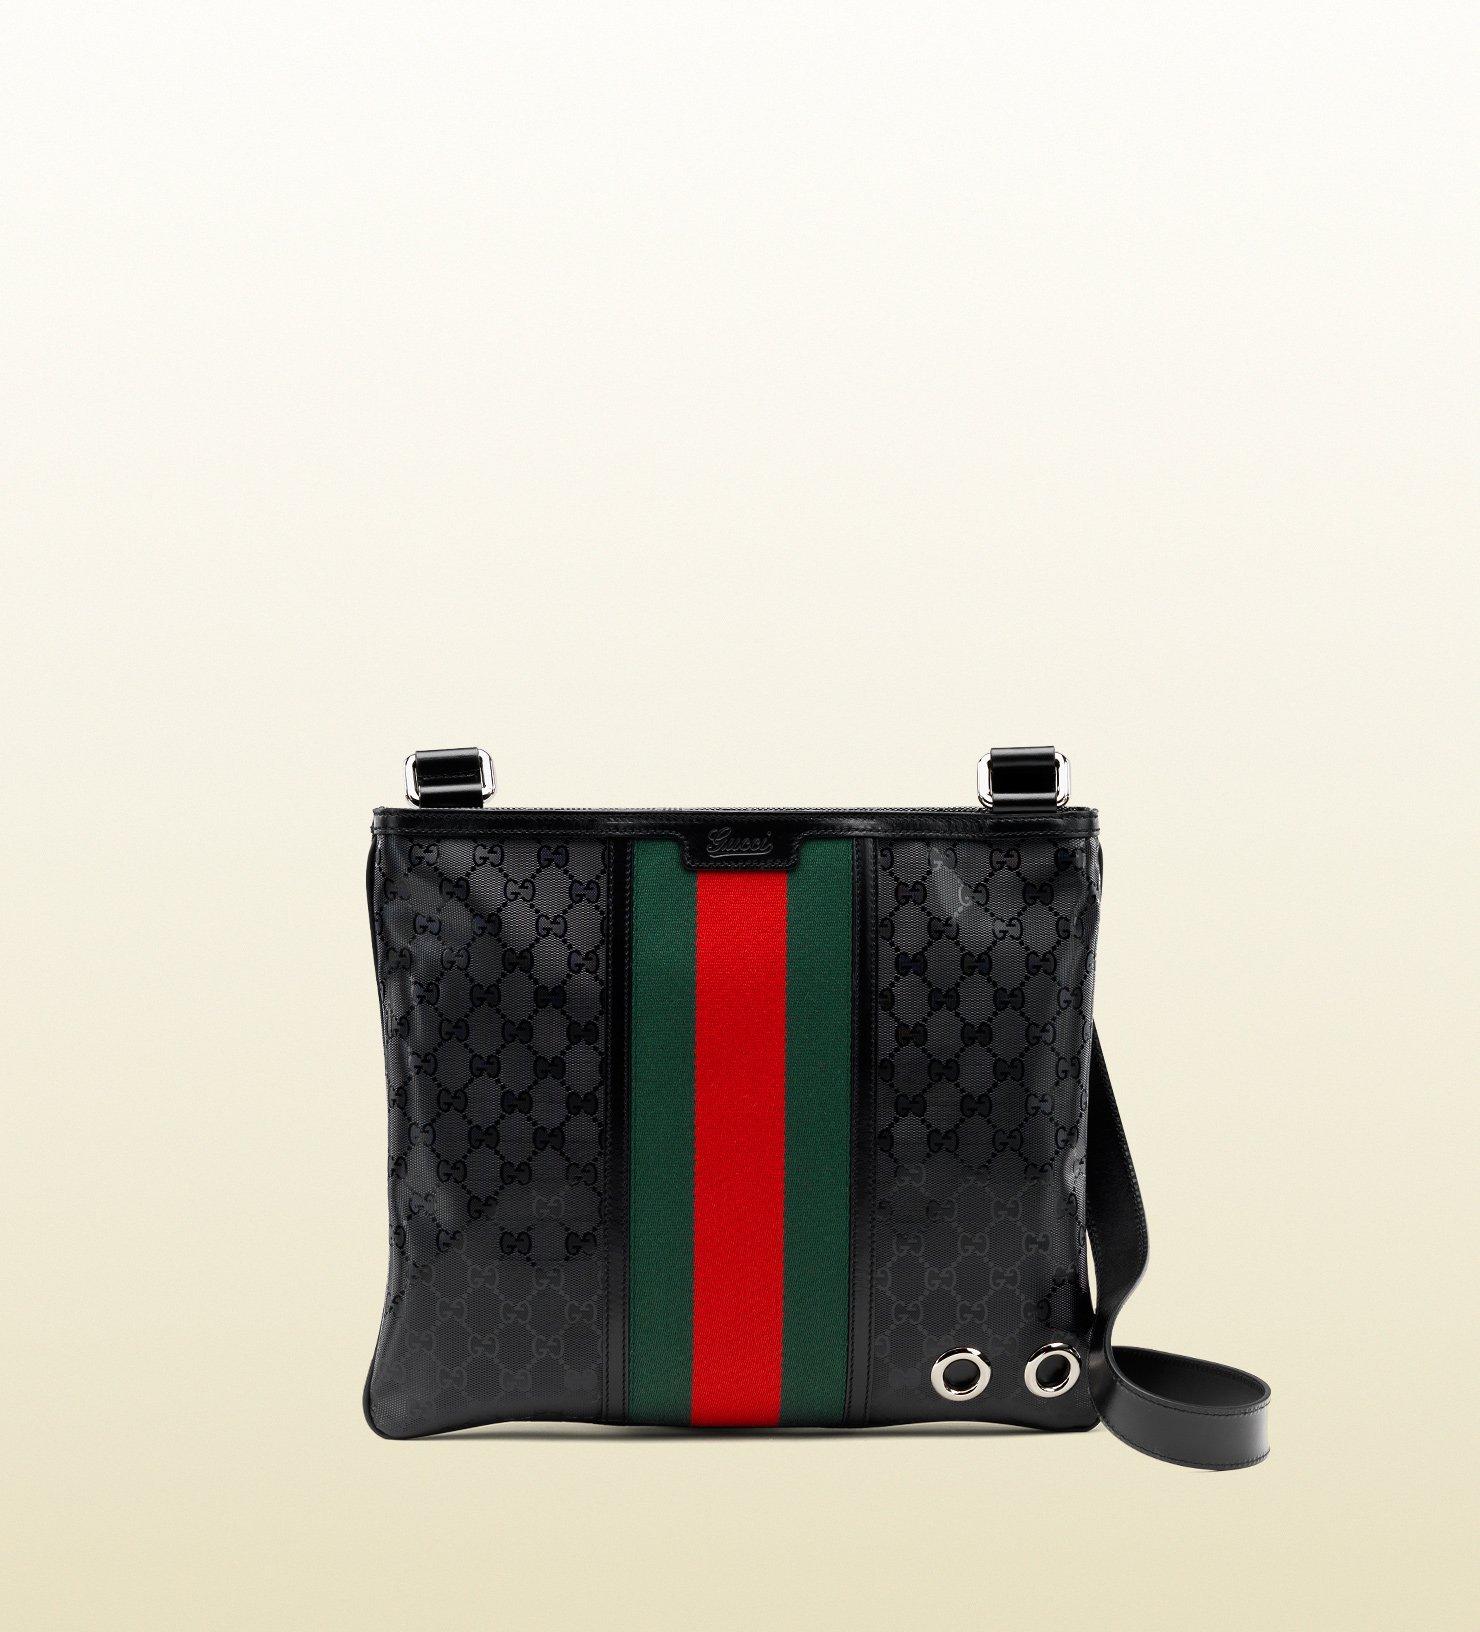 bf8101bfc Gucci 500 By Gg Imprimé Messenger Bag in Black for Men - Lyst